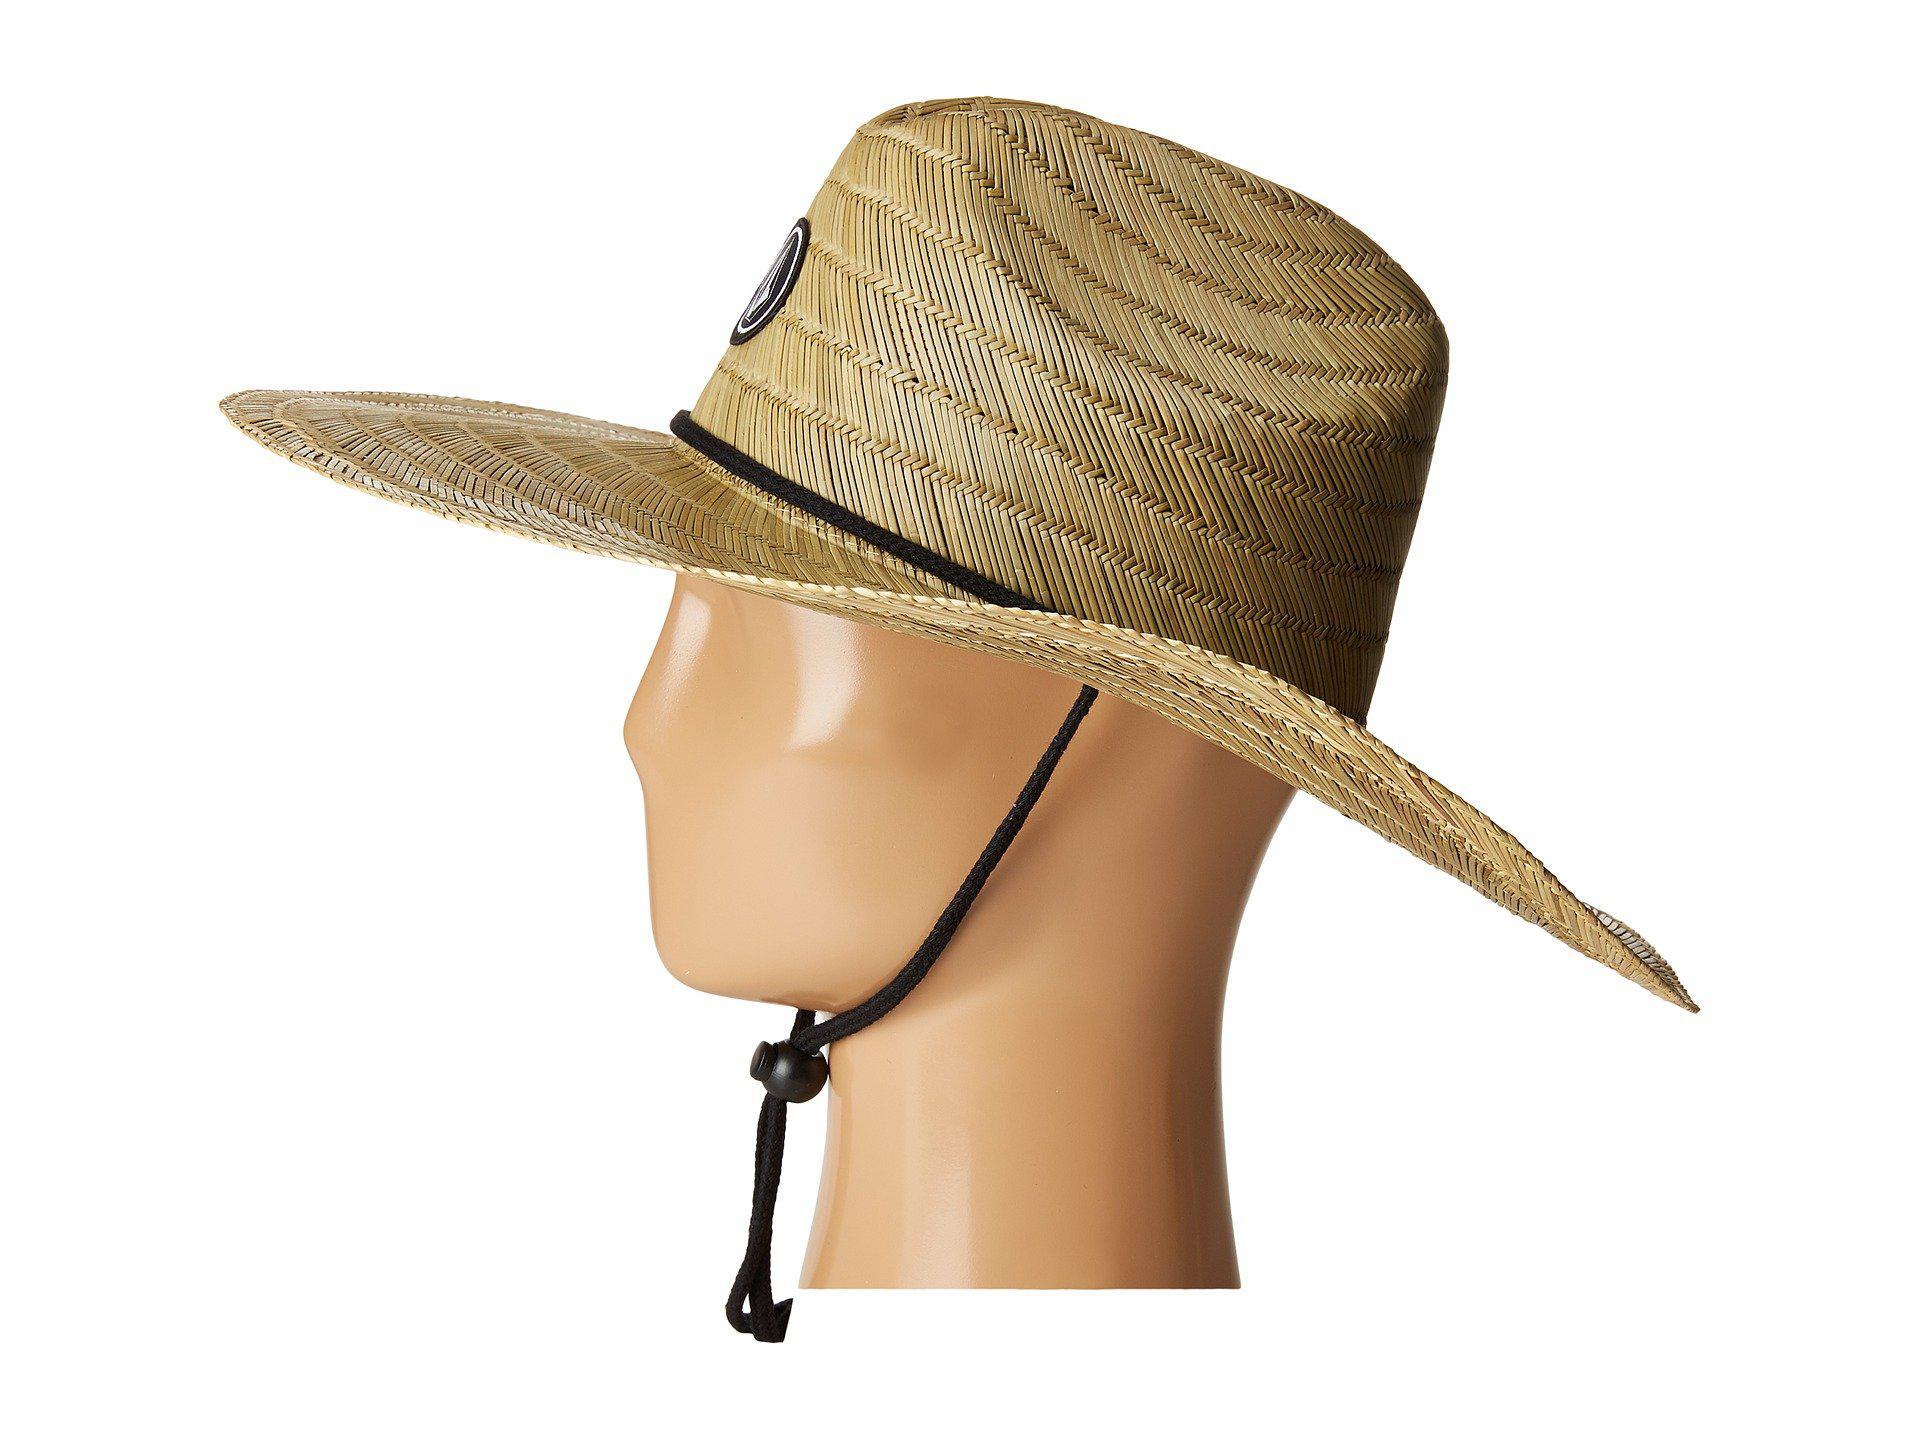 733fdcc2c Volcom Quarter Straw Hat (natural) Caps for men